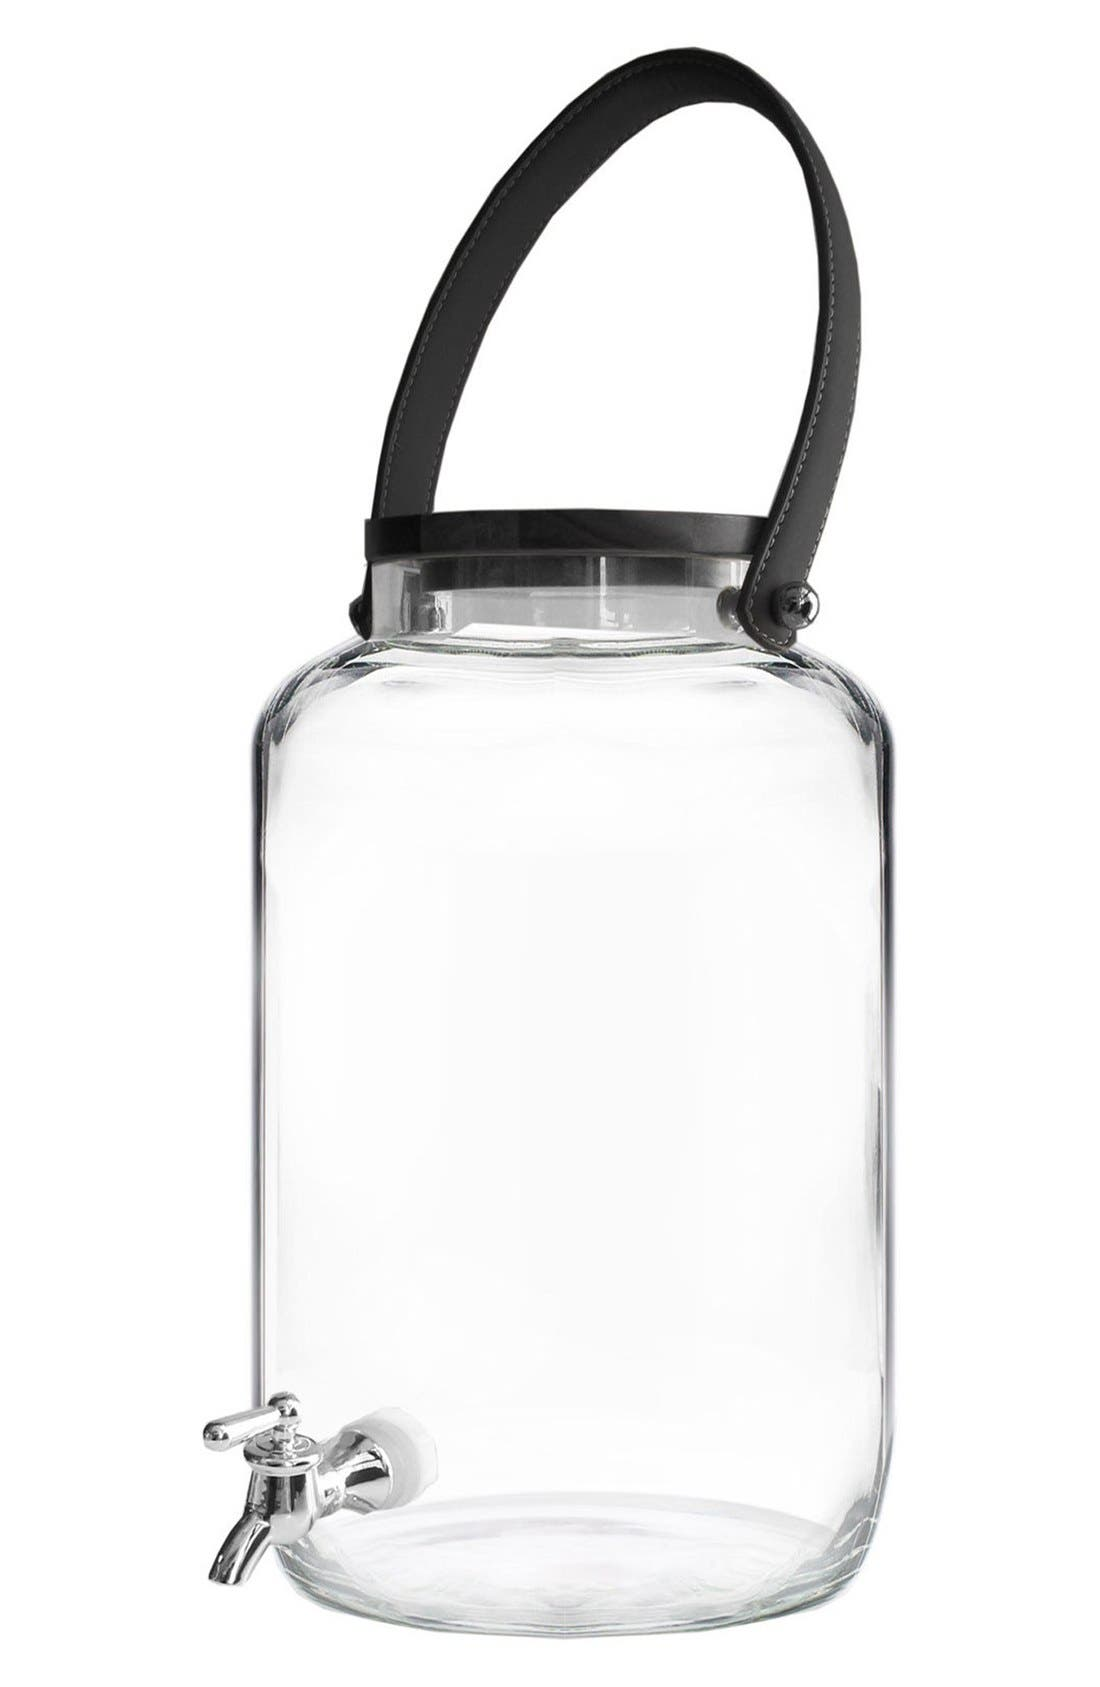 Kent 2-Gallon Beverage Dispenser,                         Main,                         color, 100